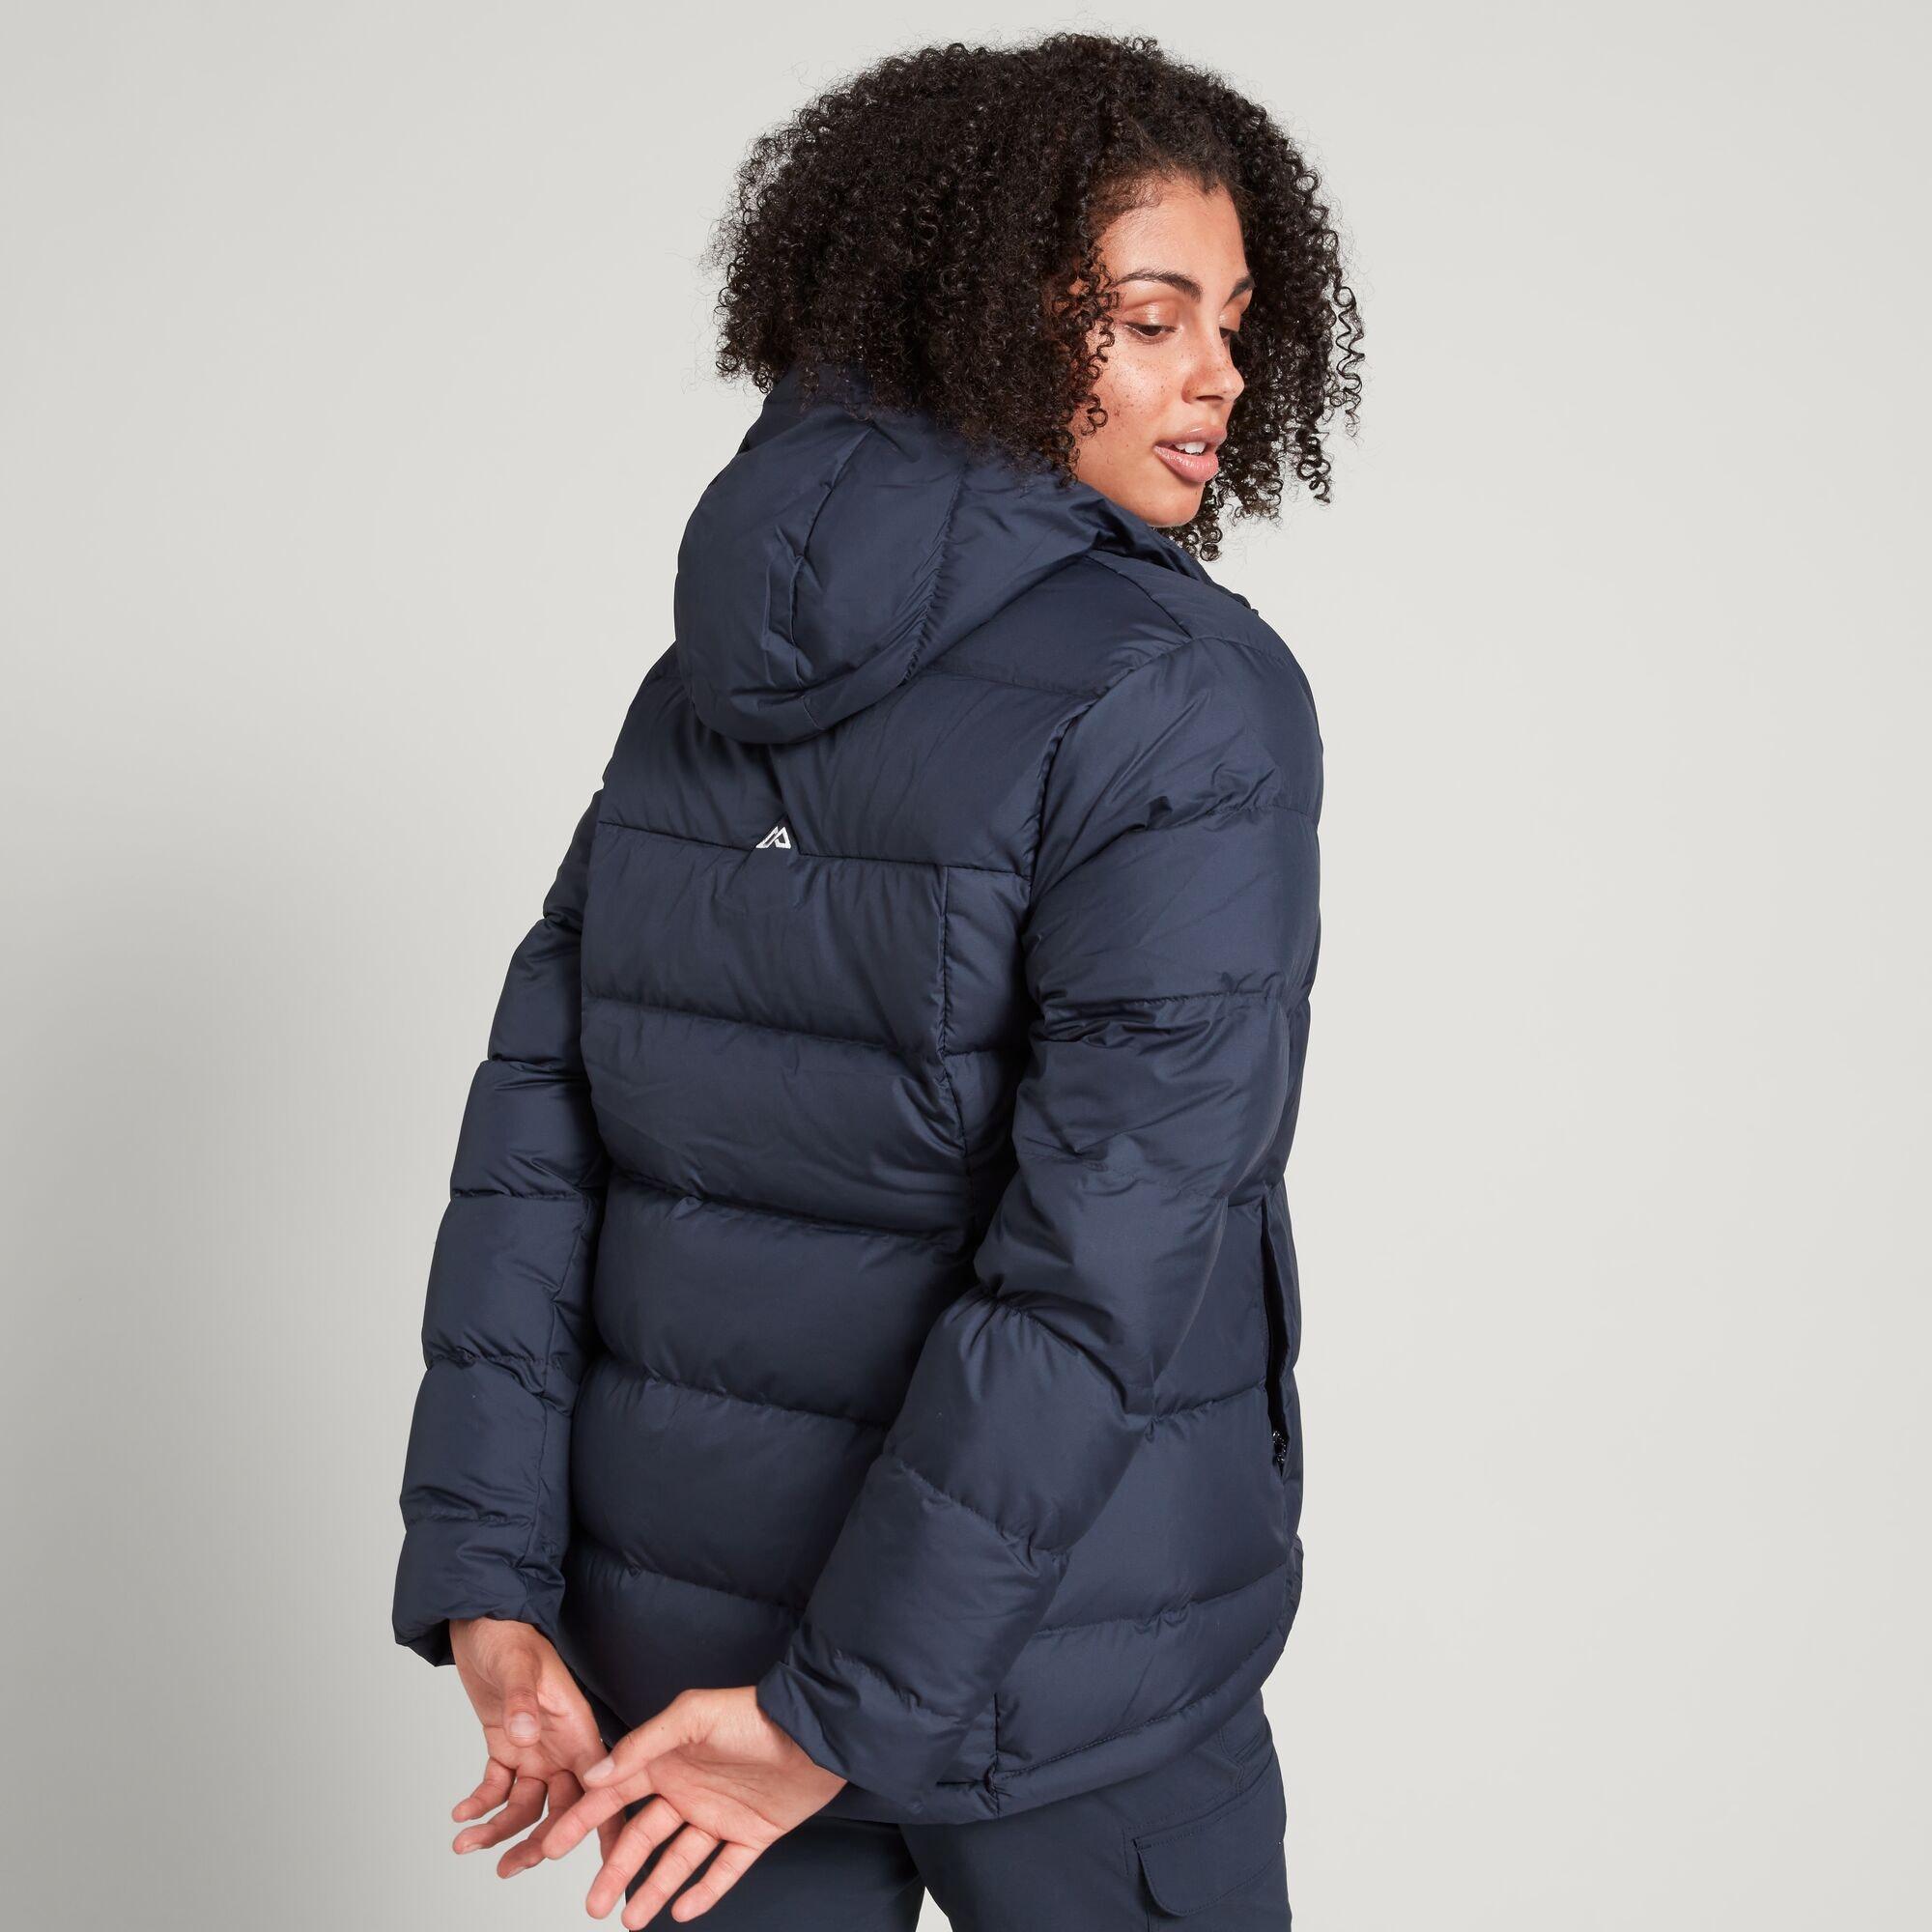 thumbnail 15 - NEW Kathmandu Epiq Womens Hooded Down Puffer 600 Fill Warm Outdoor Winter Jacket